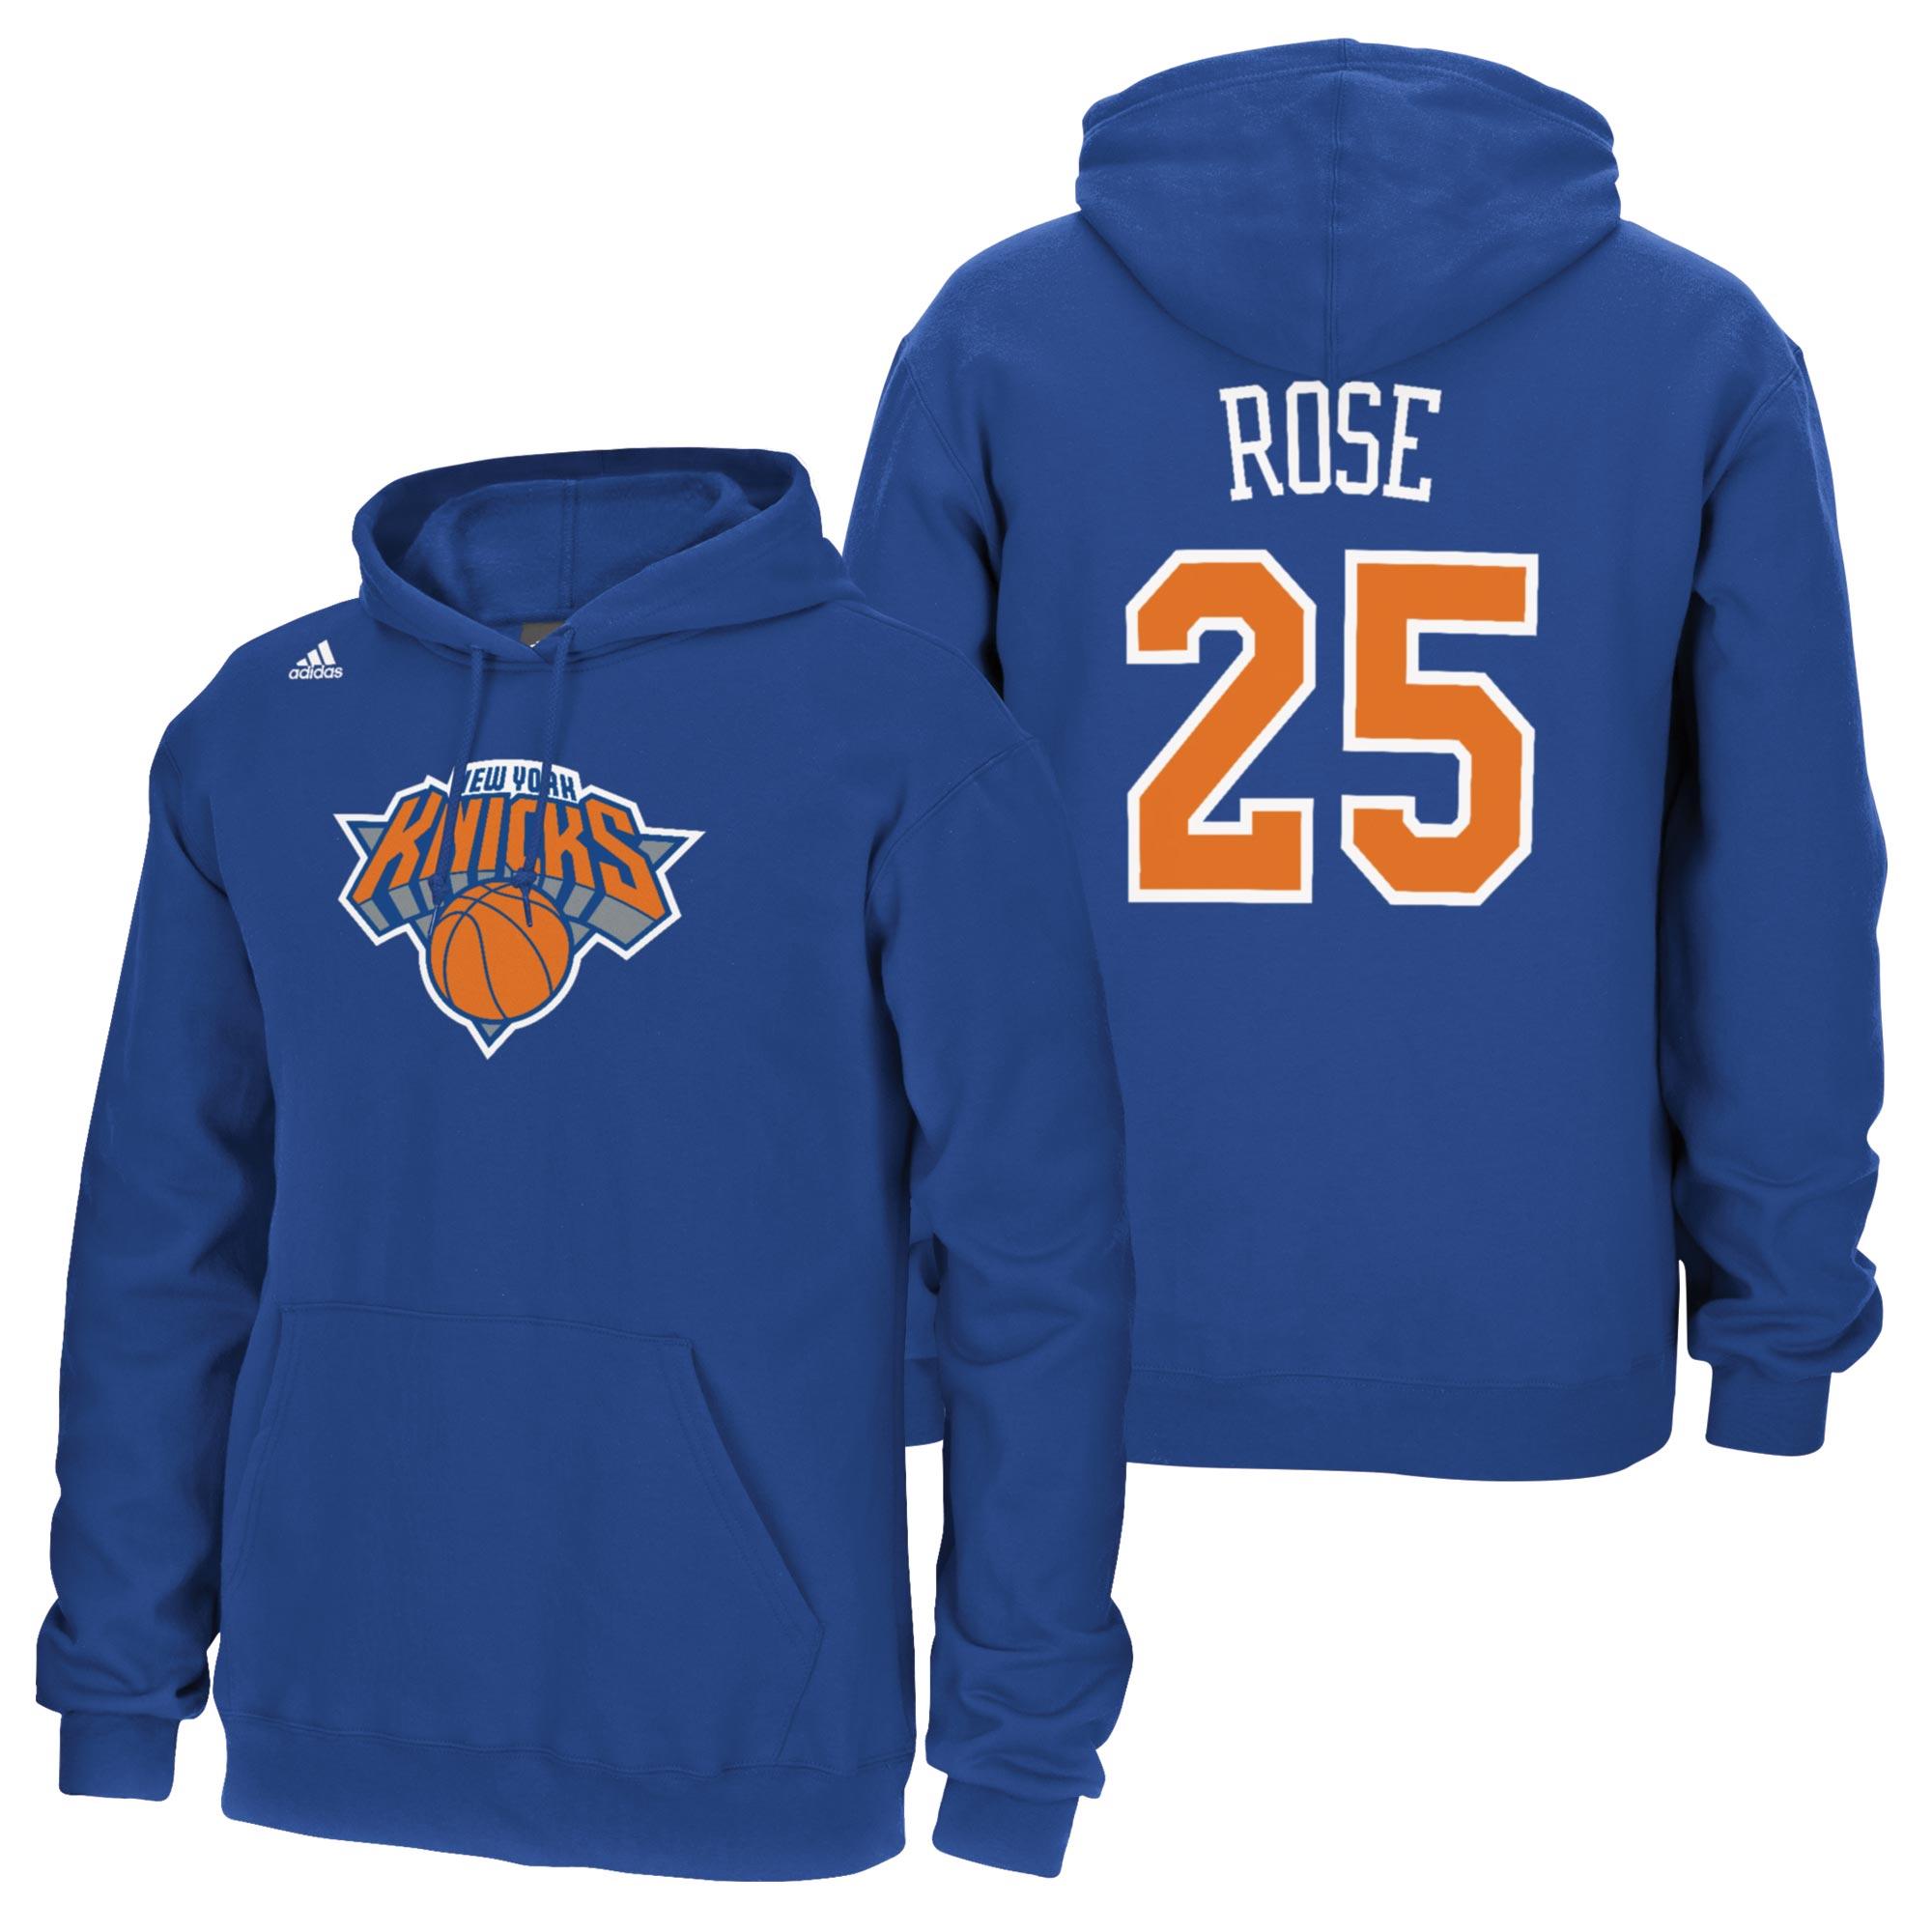 New York Knicks adidas Name & Number Hoodie - Derrick Rose - Mens